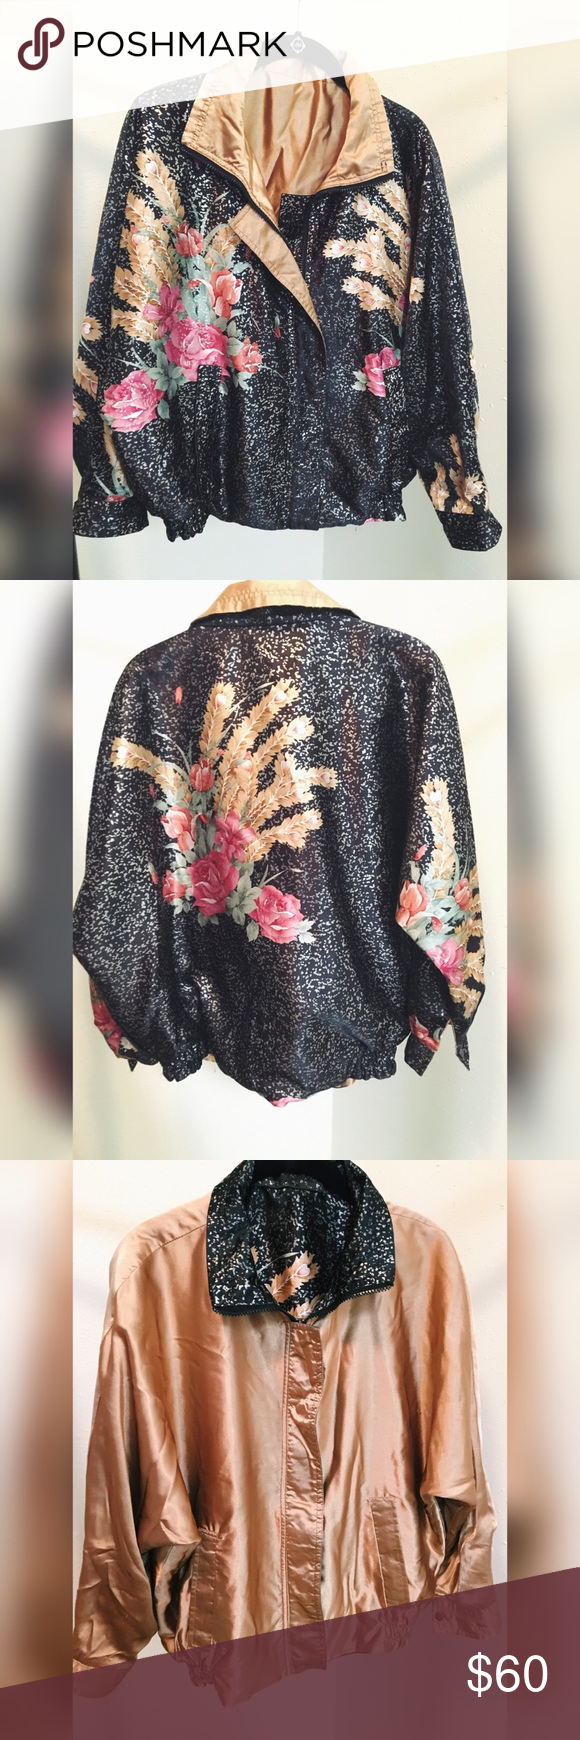 Reversible silk windbreaker Flashy yet classy! Jackets & Coats